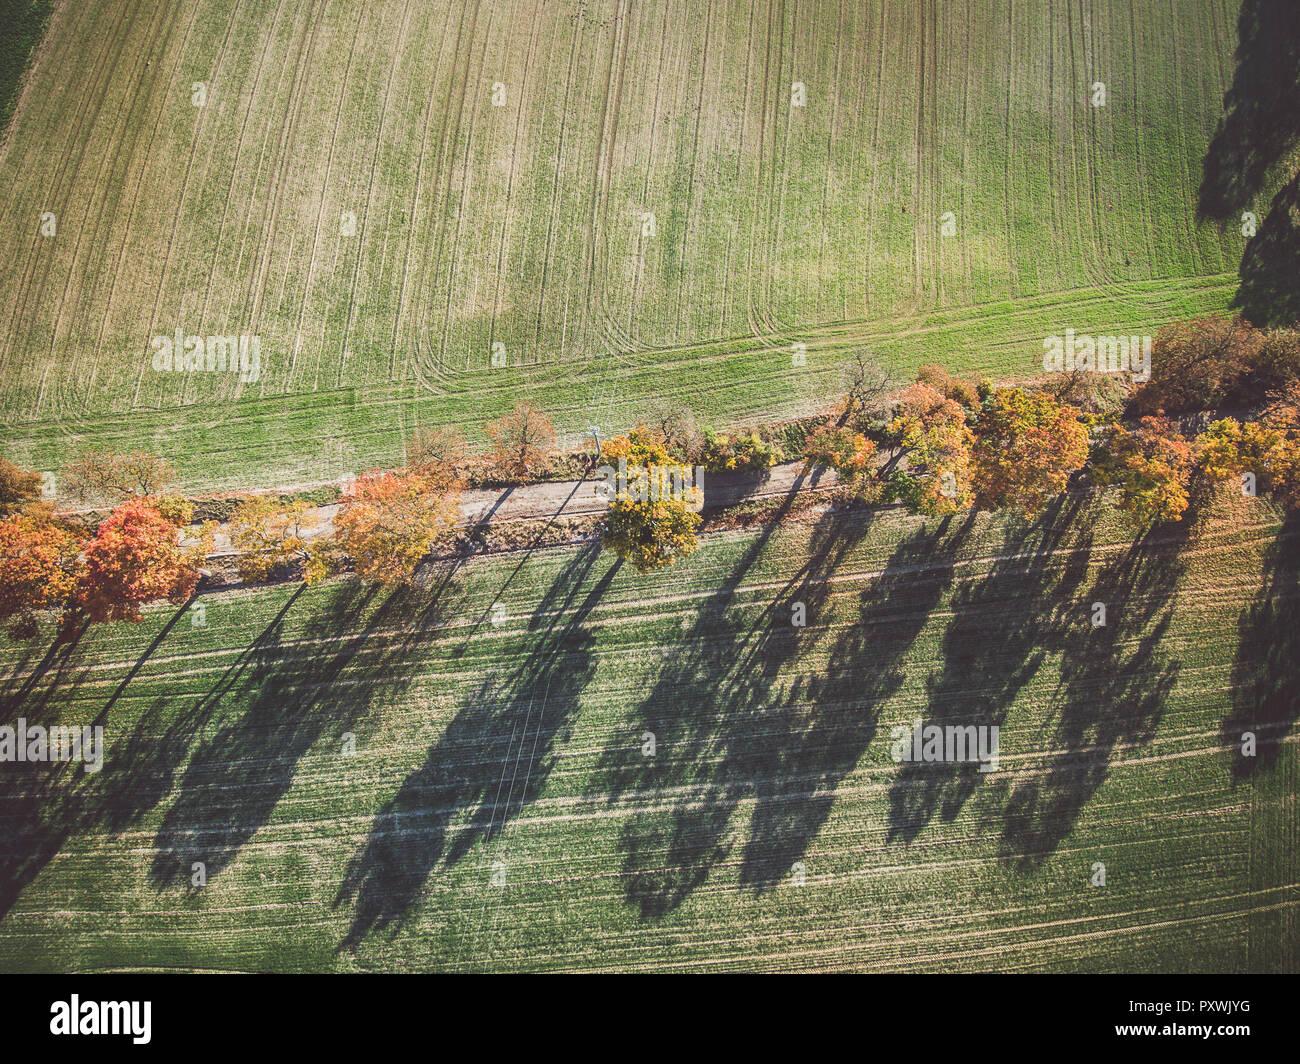 Callejón de otoño de árboles entre verdes campos en campo Foto de stock